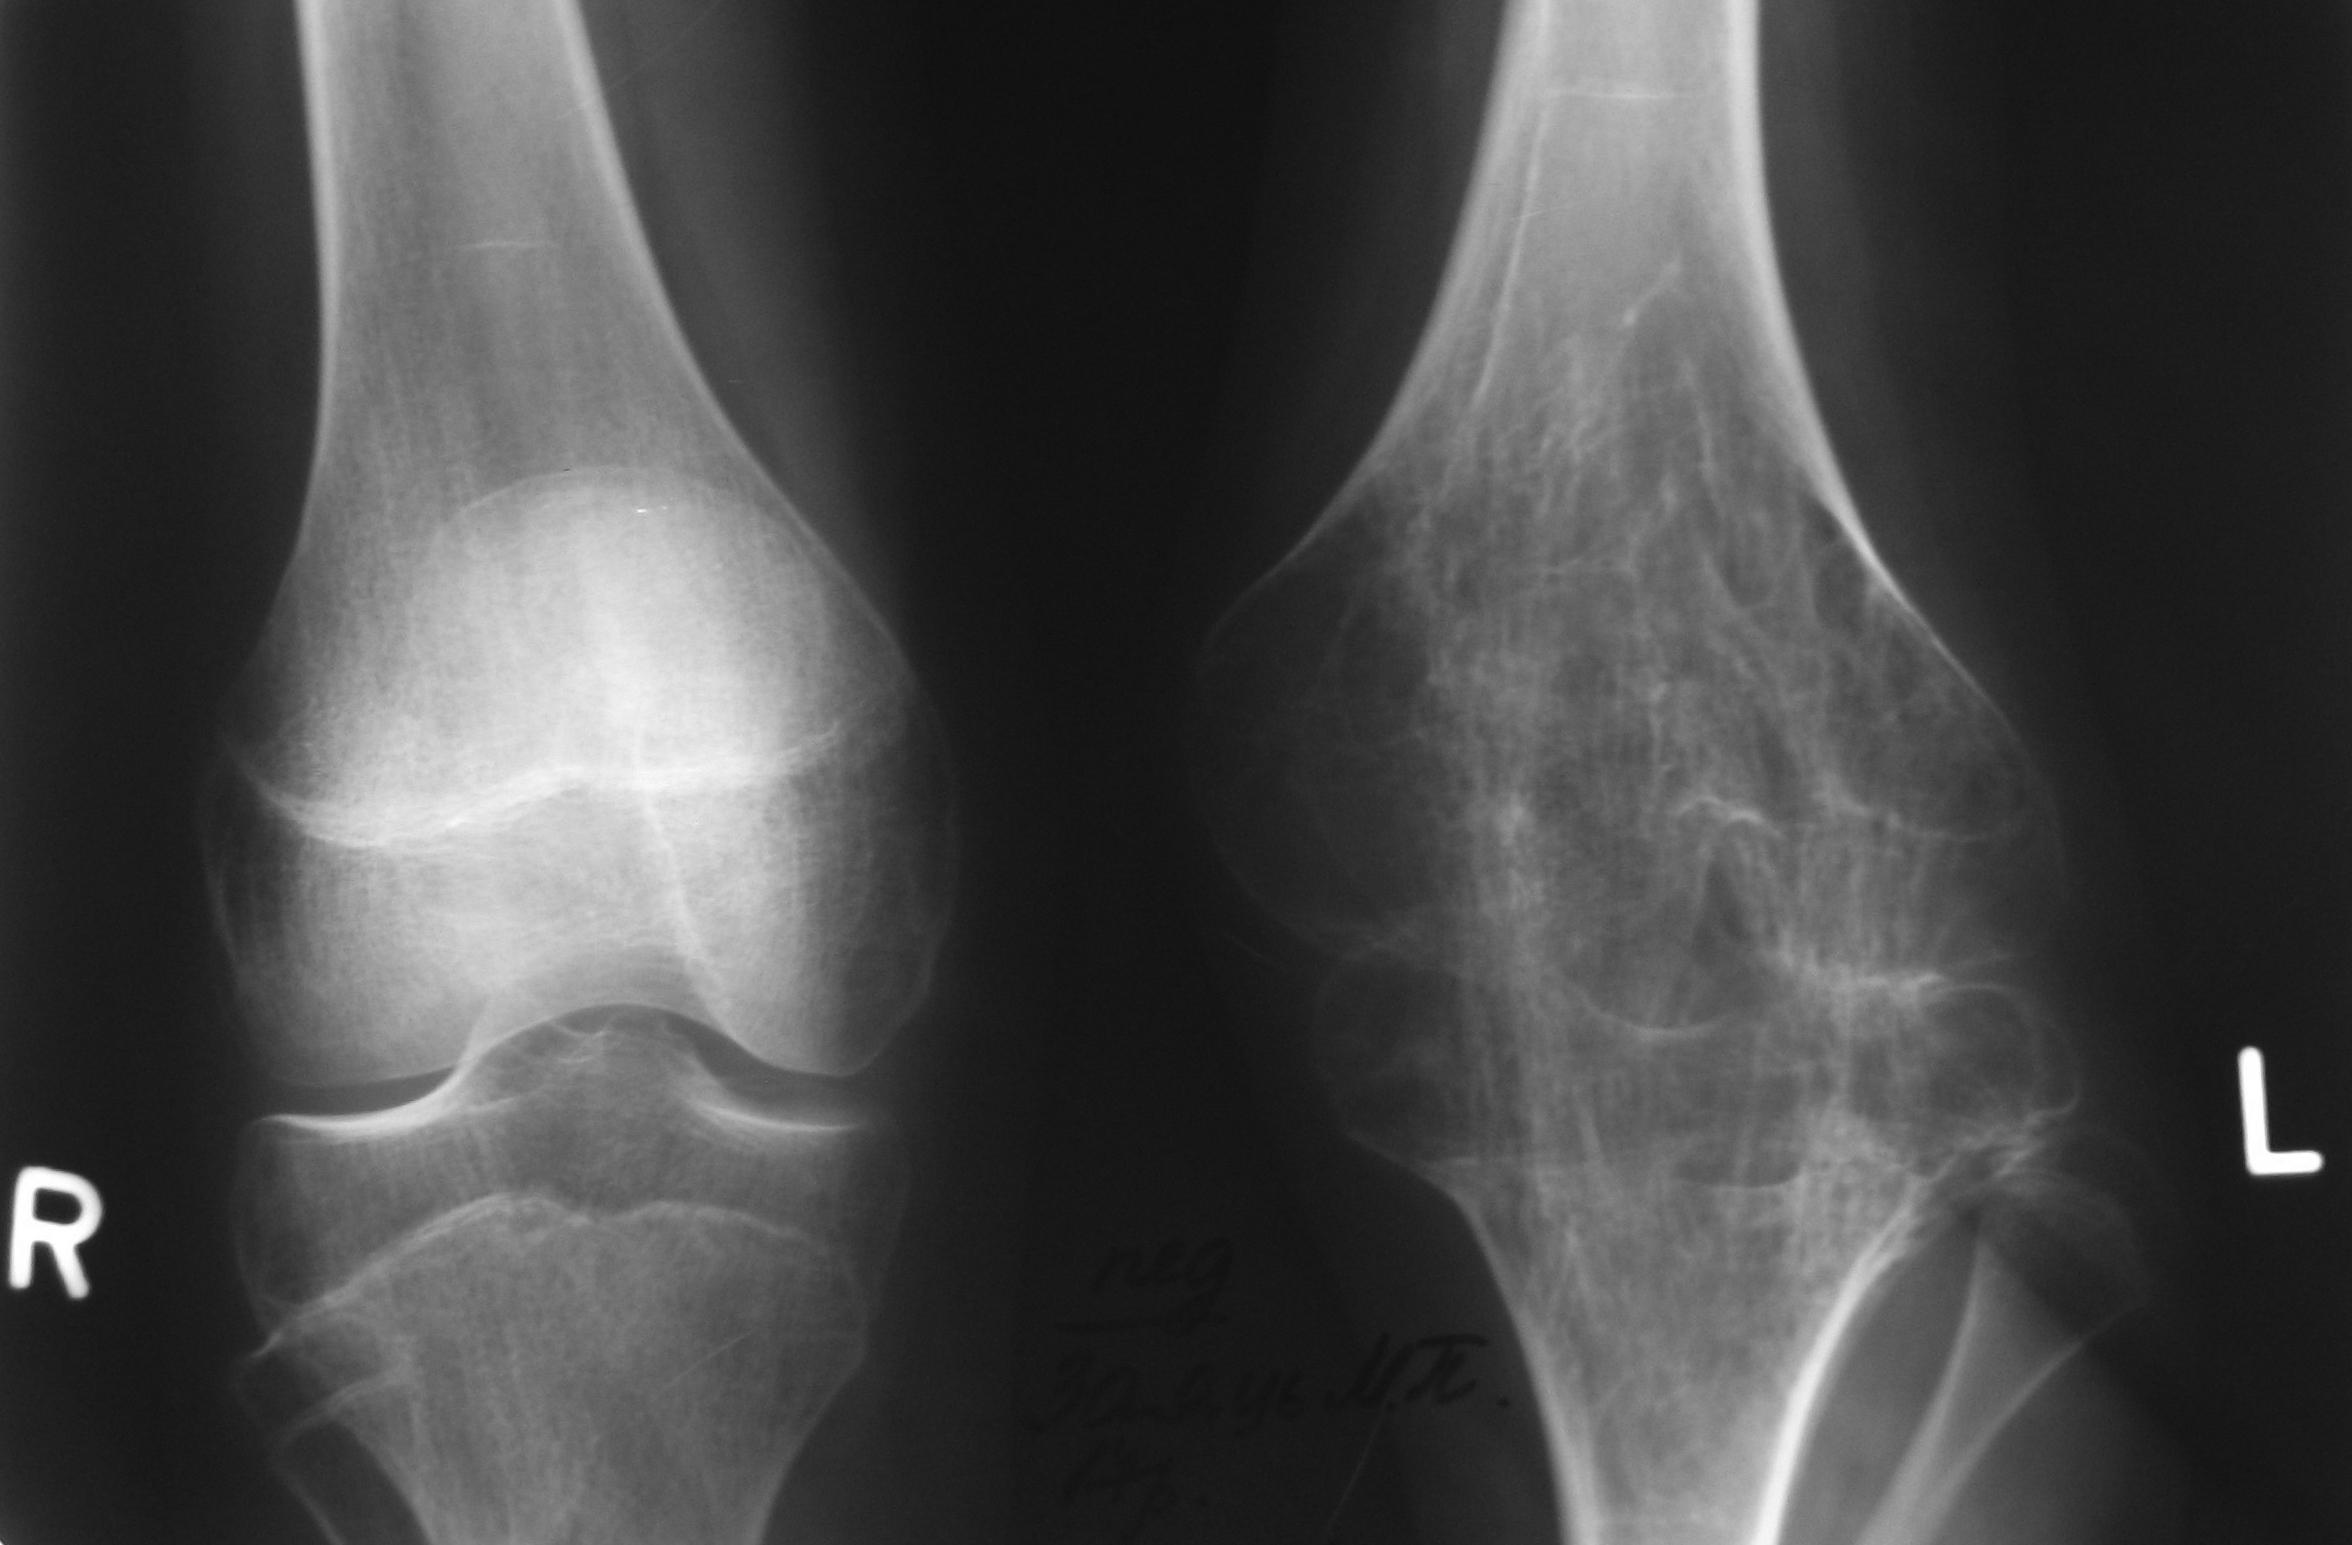 Gonarthritis